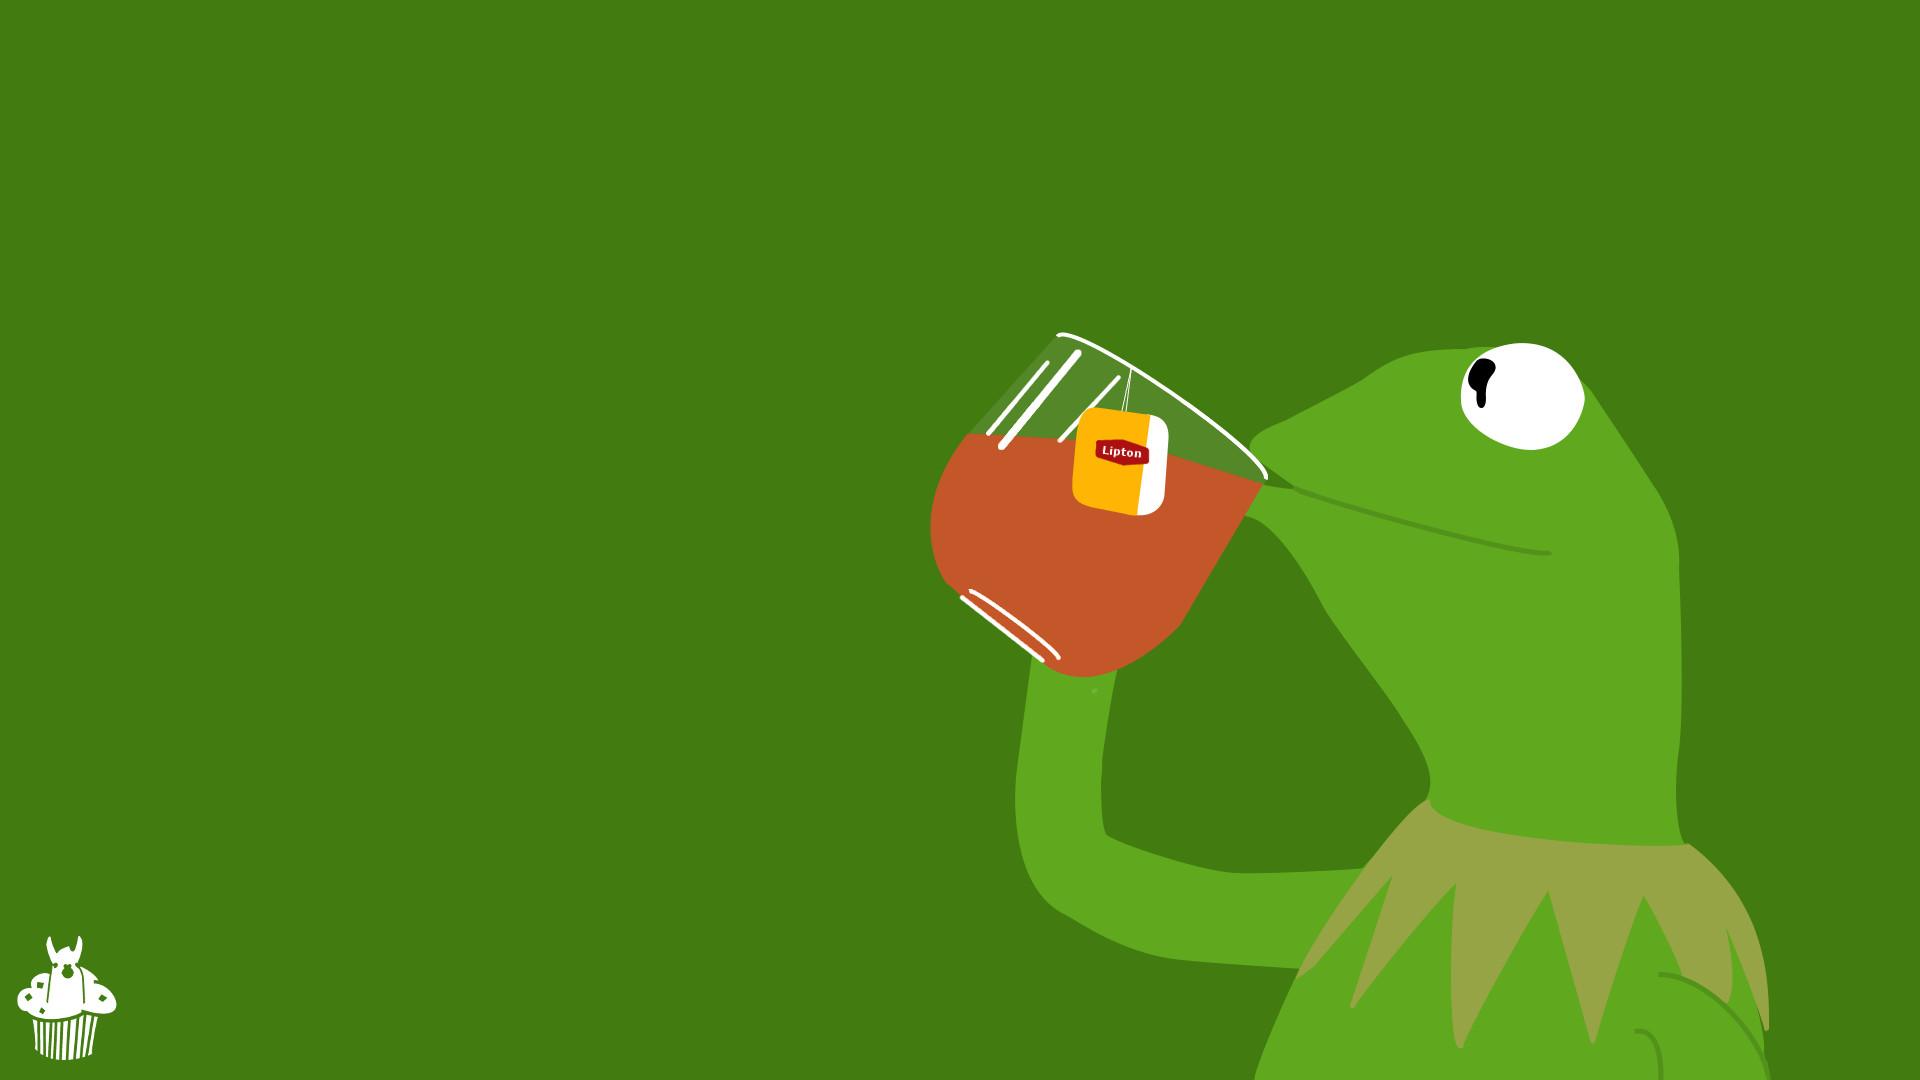 kermit de frog here wallpaper by llamamoofin d96slva 670×377 – 20+ Best HD  Wallpapers For